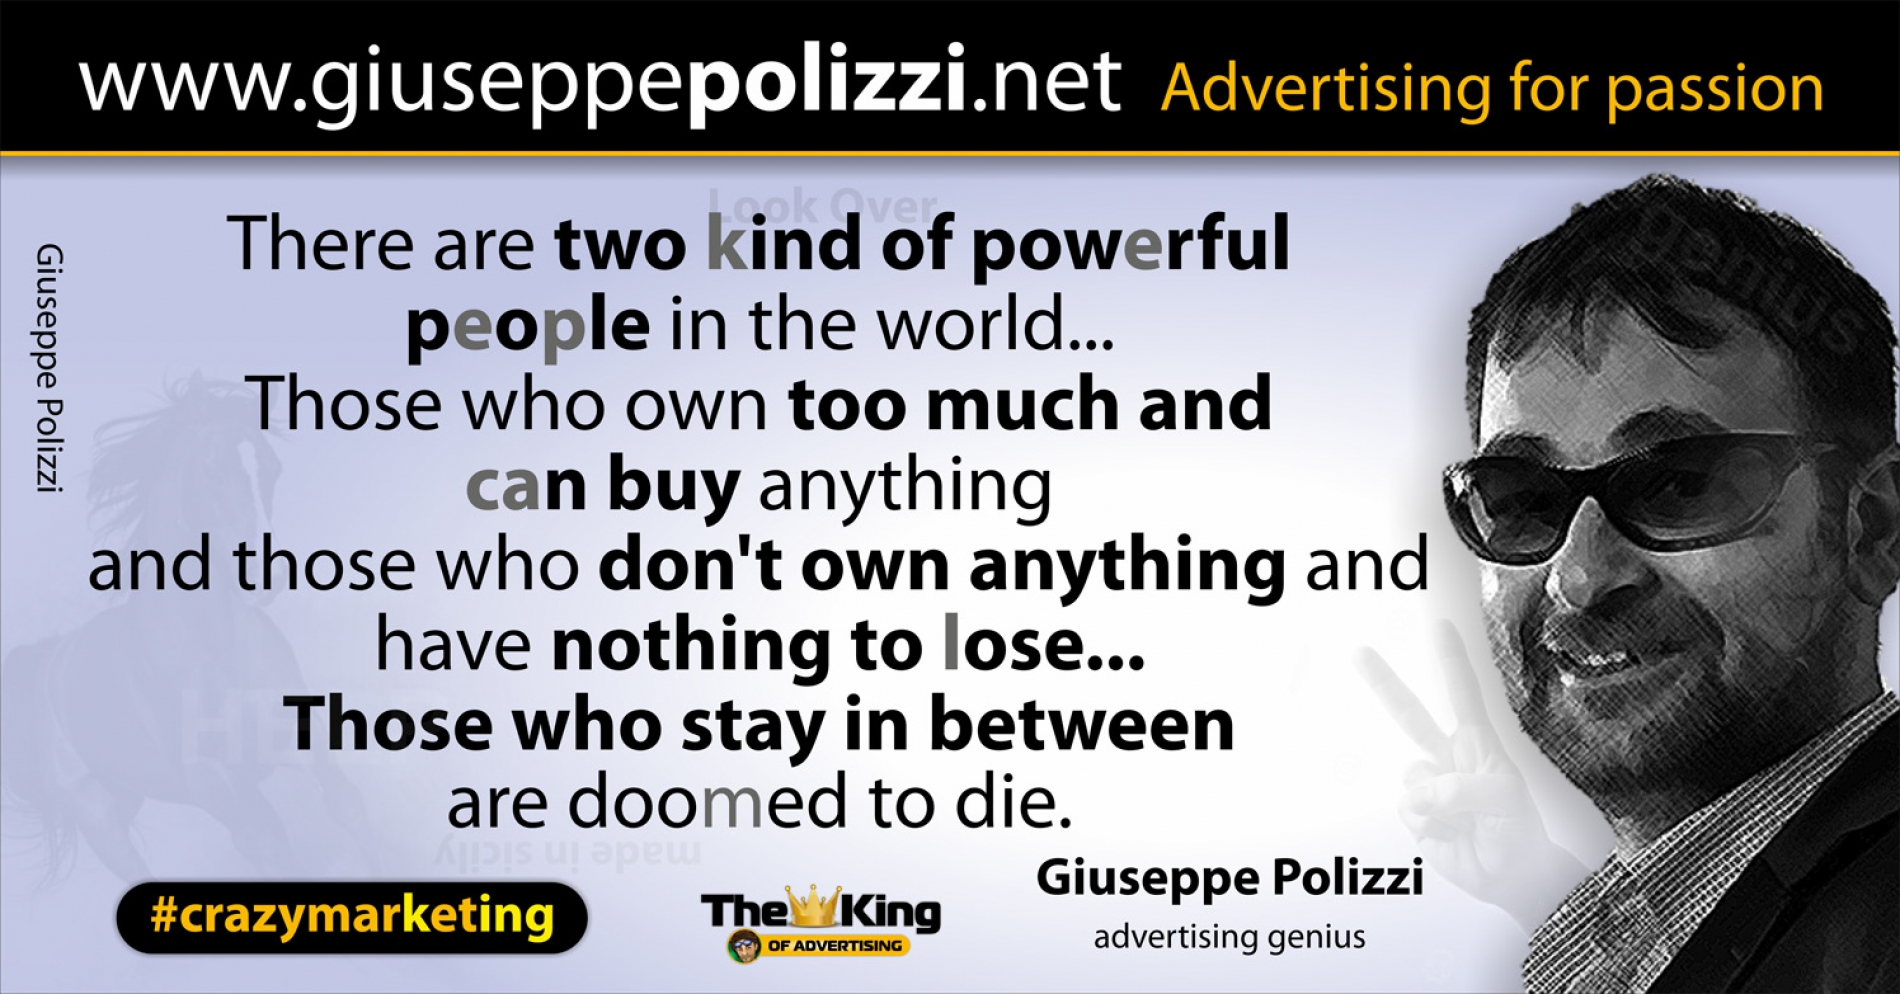 giuseppe polizzi aforismi potenza 2016 crazymarketing inglese